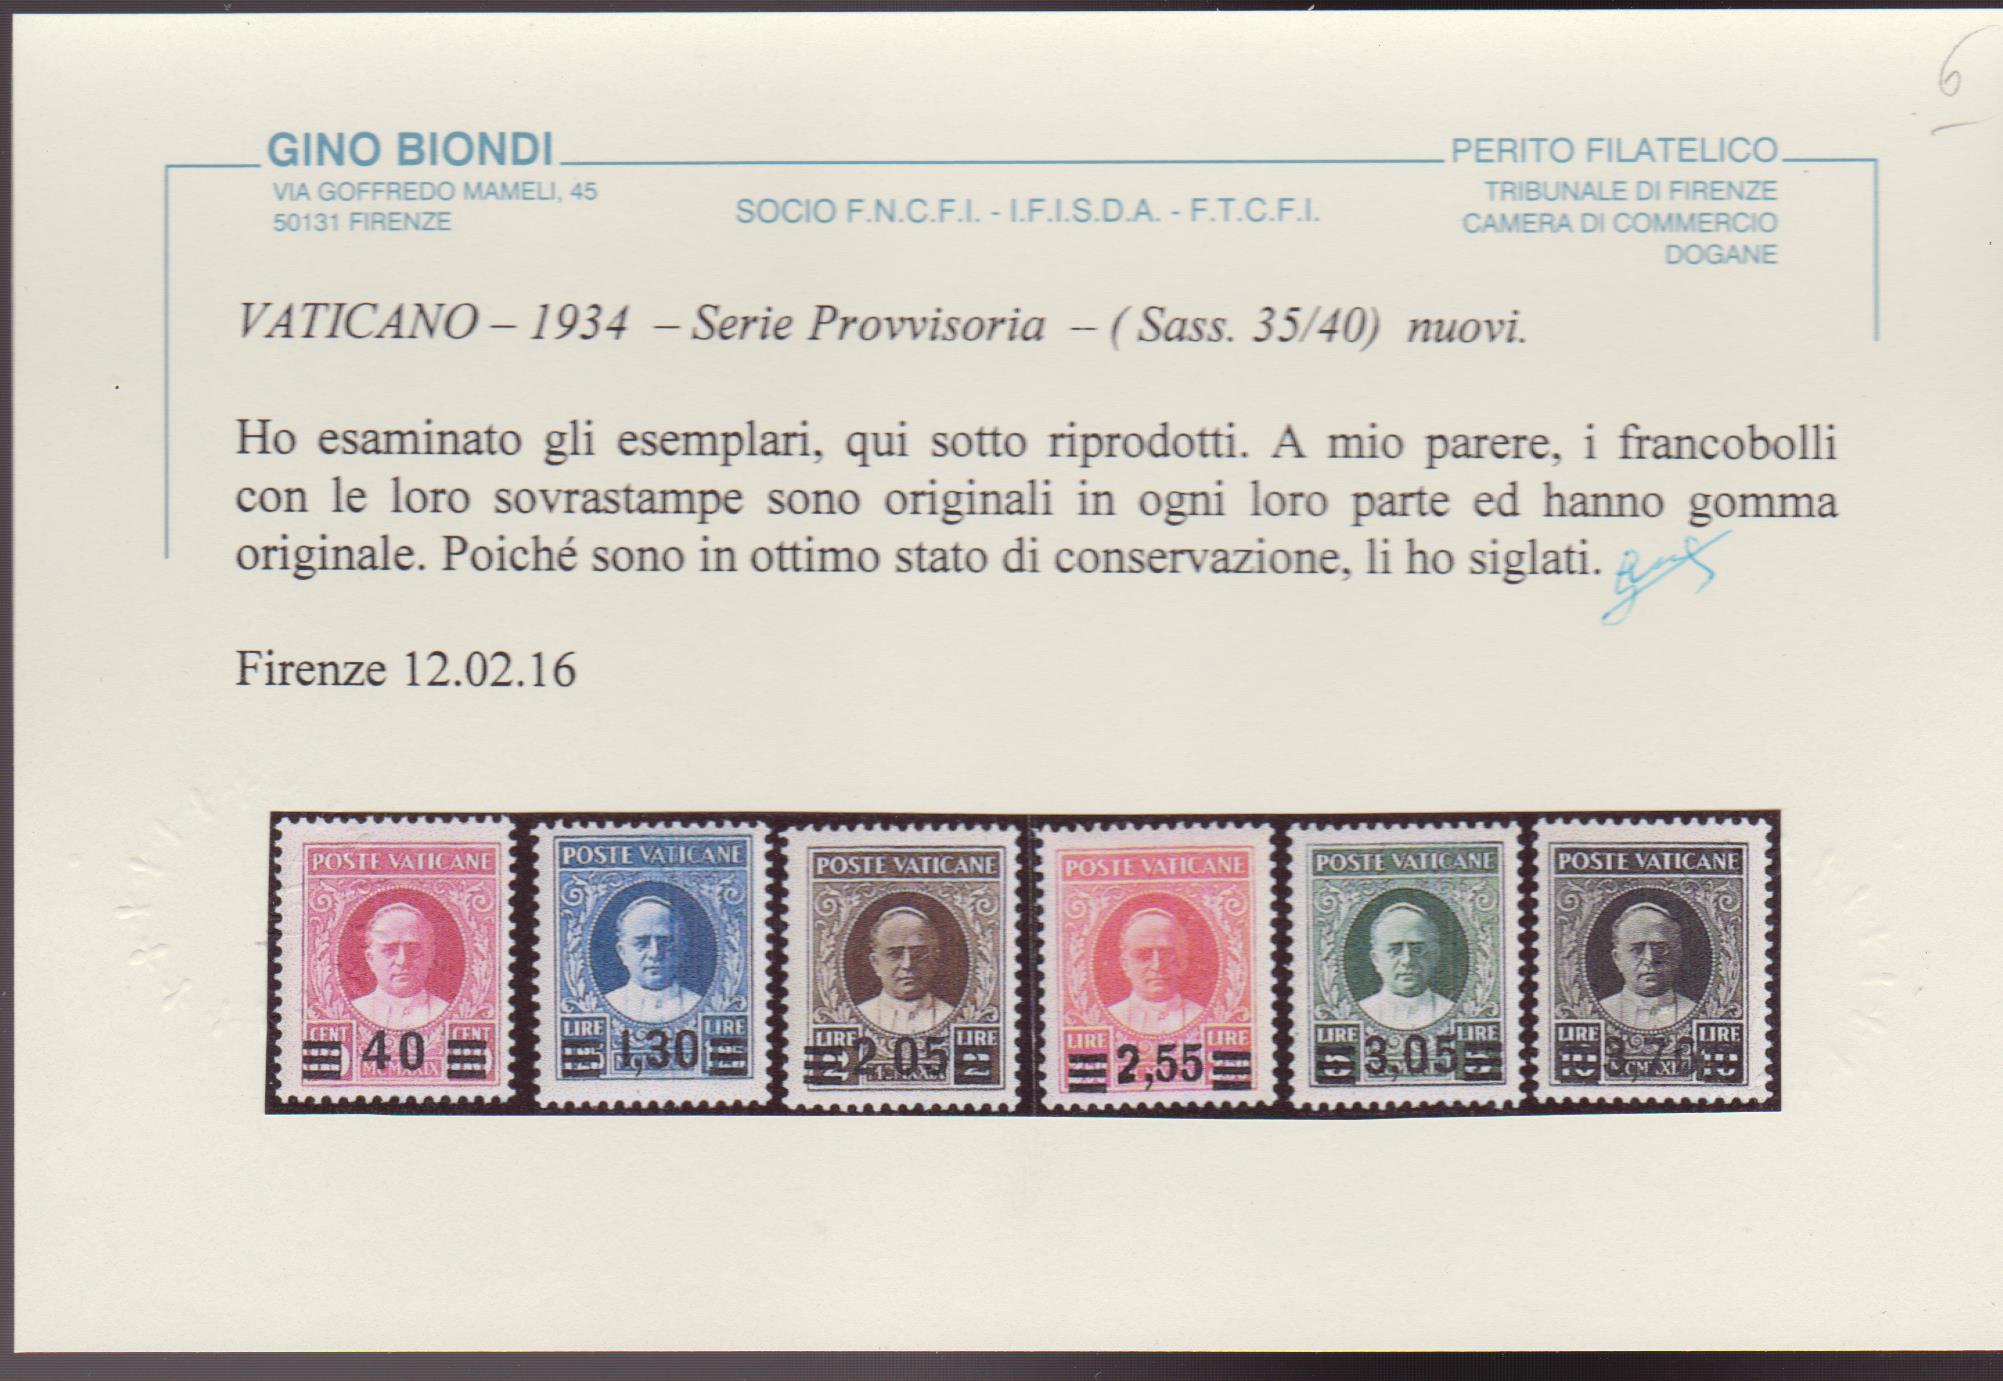 cert-vaticano-biondi-001